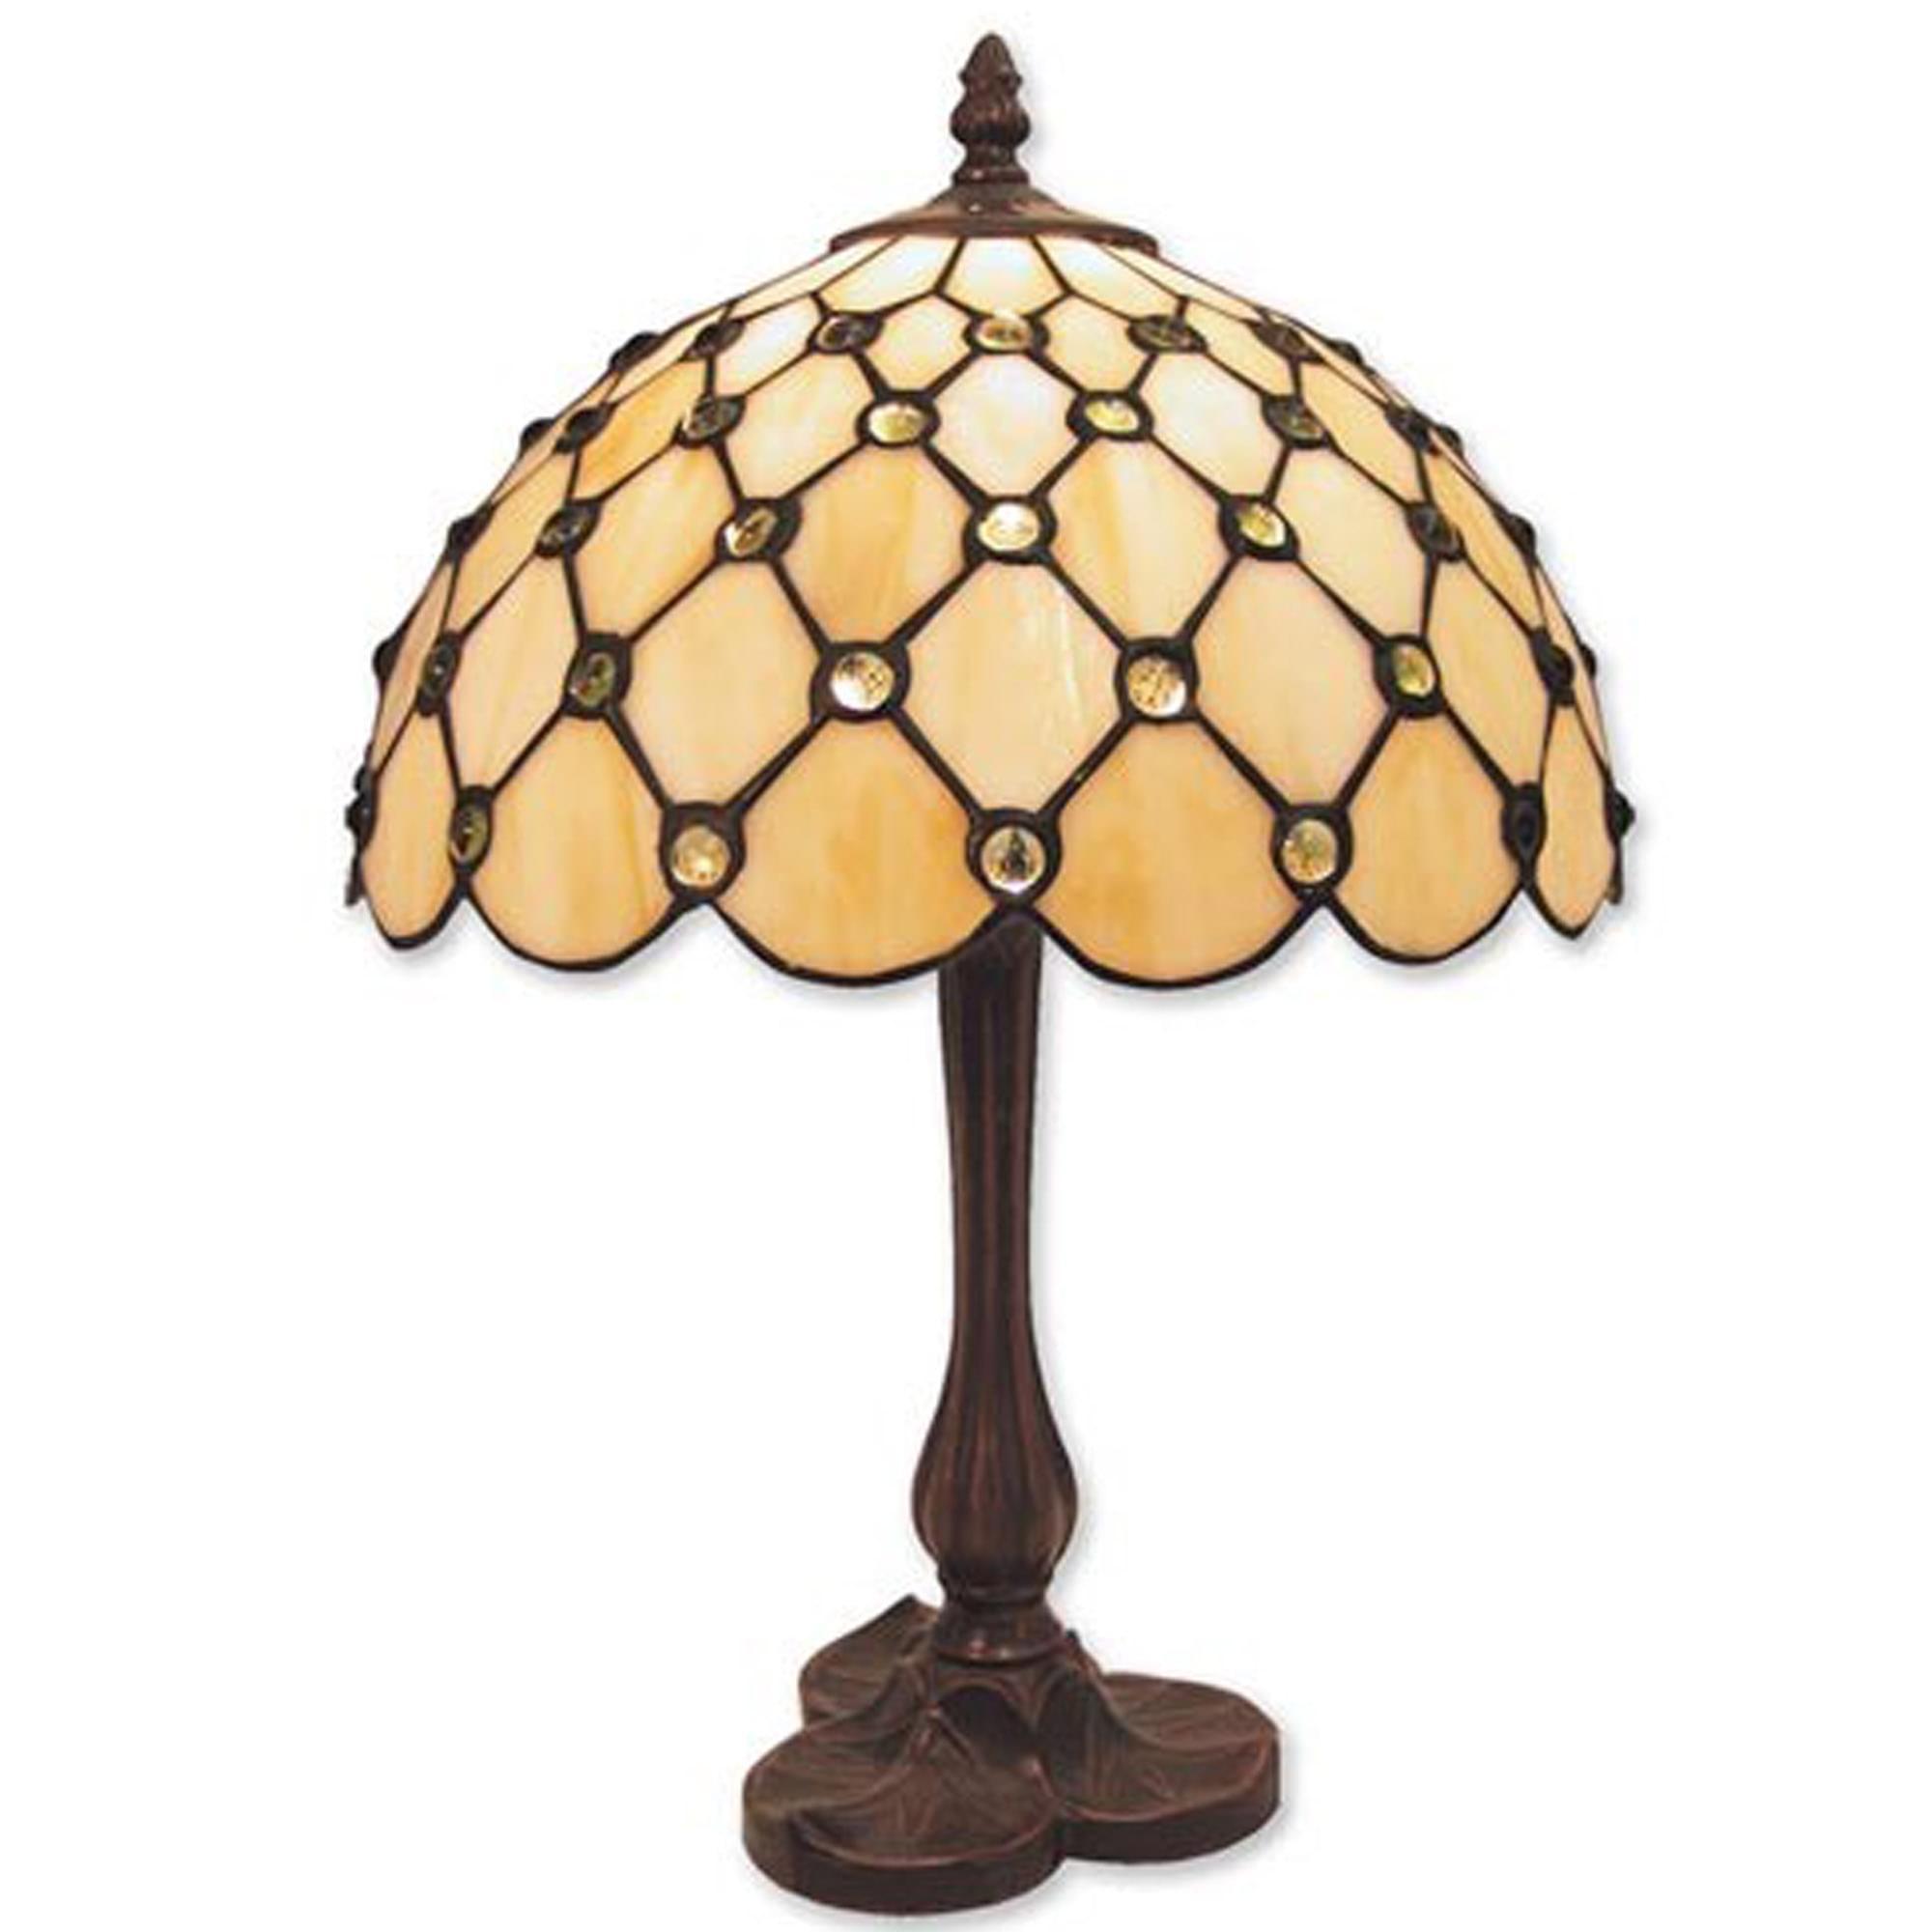 Antique French Style Cream Jewelled Medium Tiffany Table Lamp